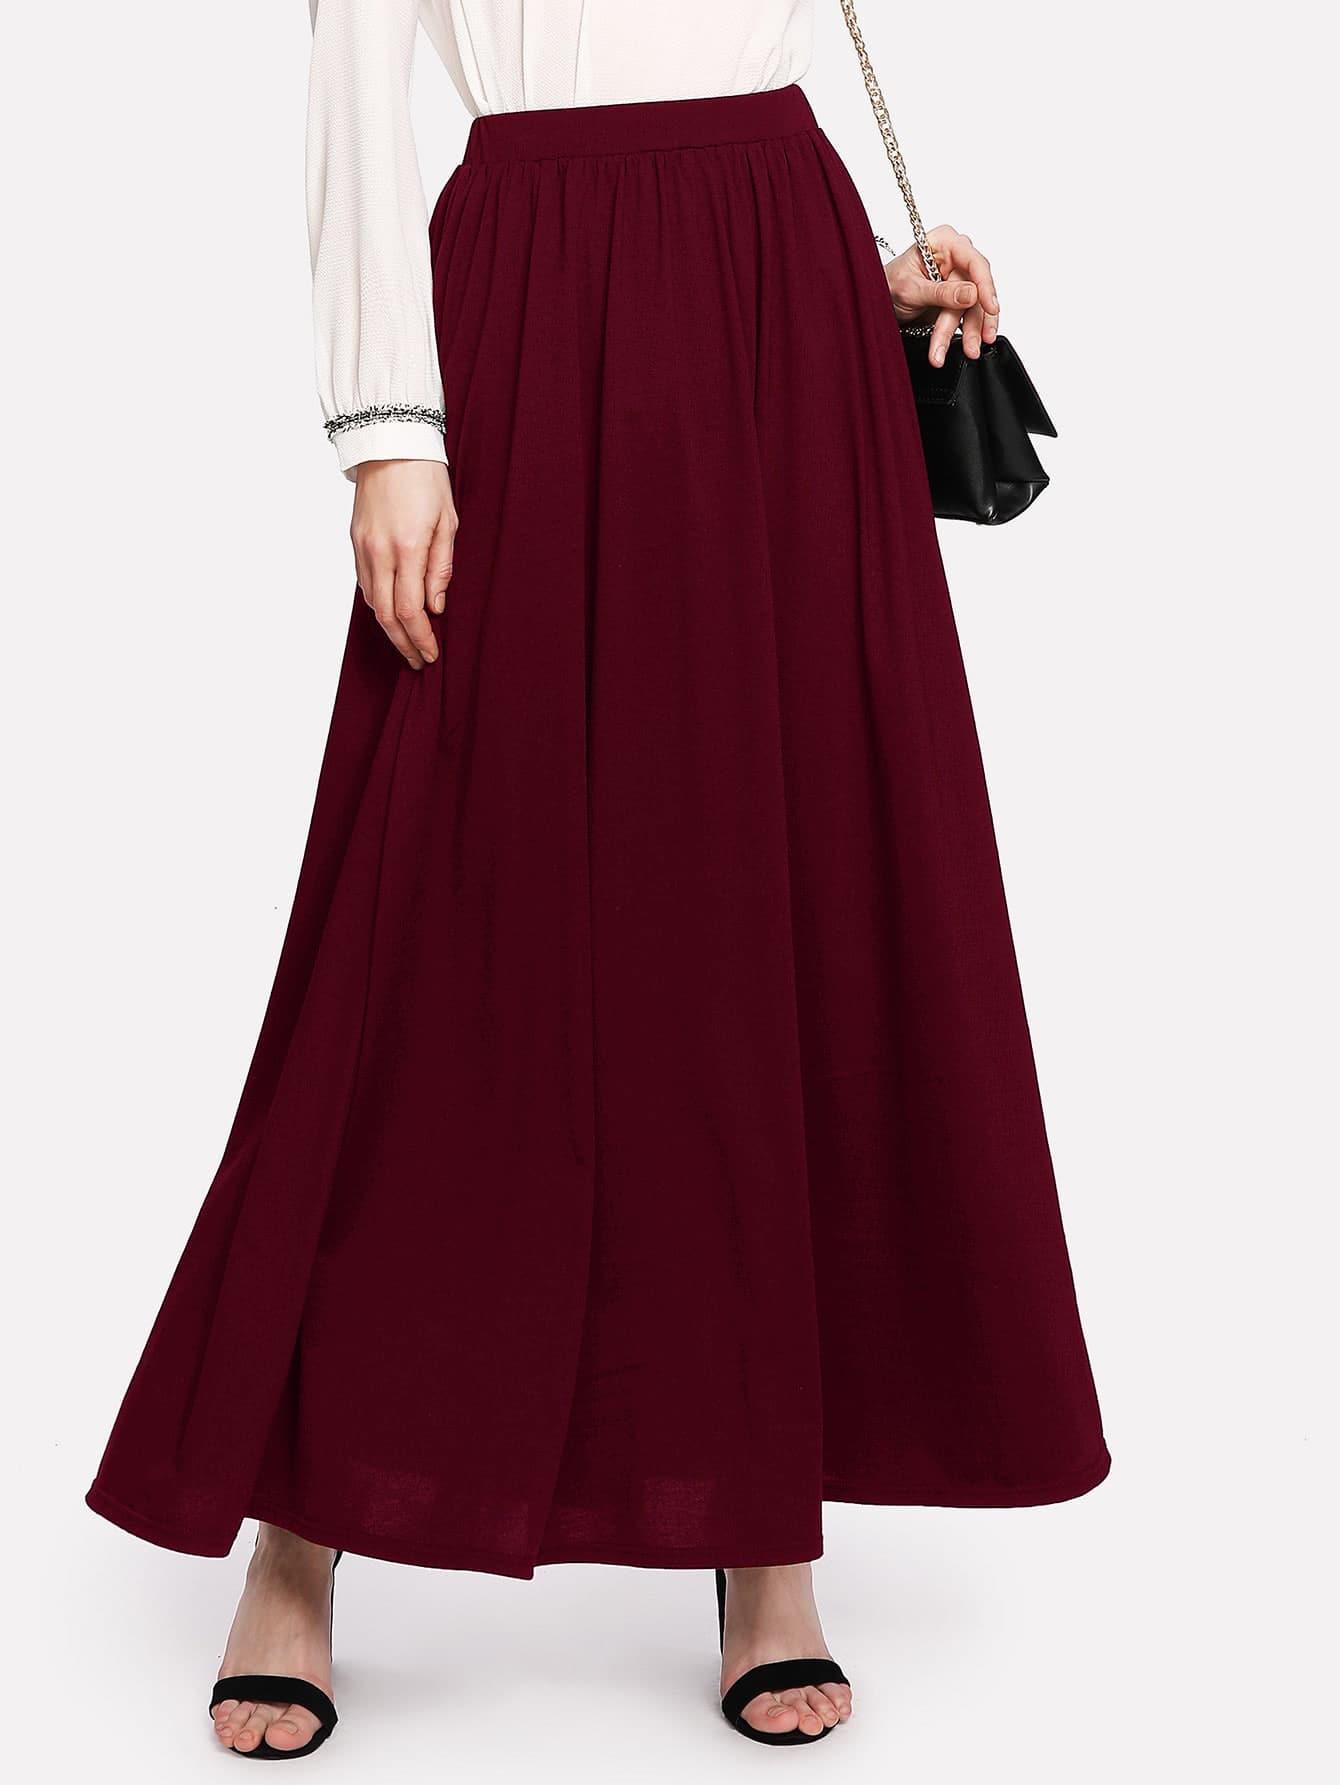 Купить Однотонная юбка, Ksenia G, SheIn